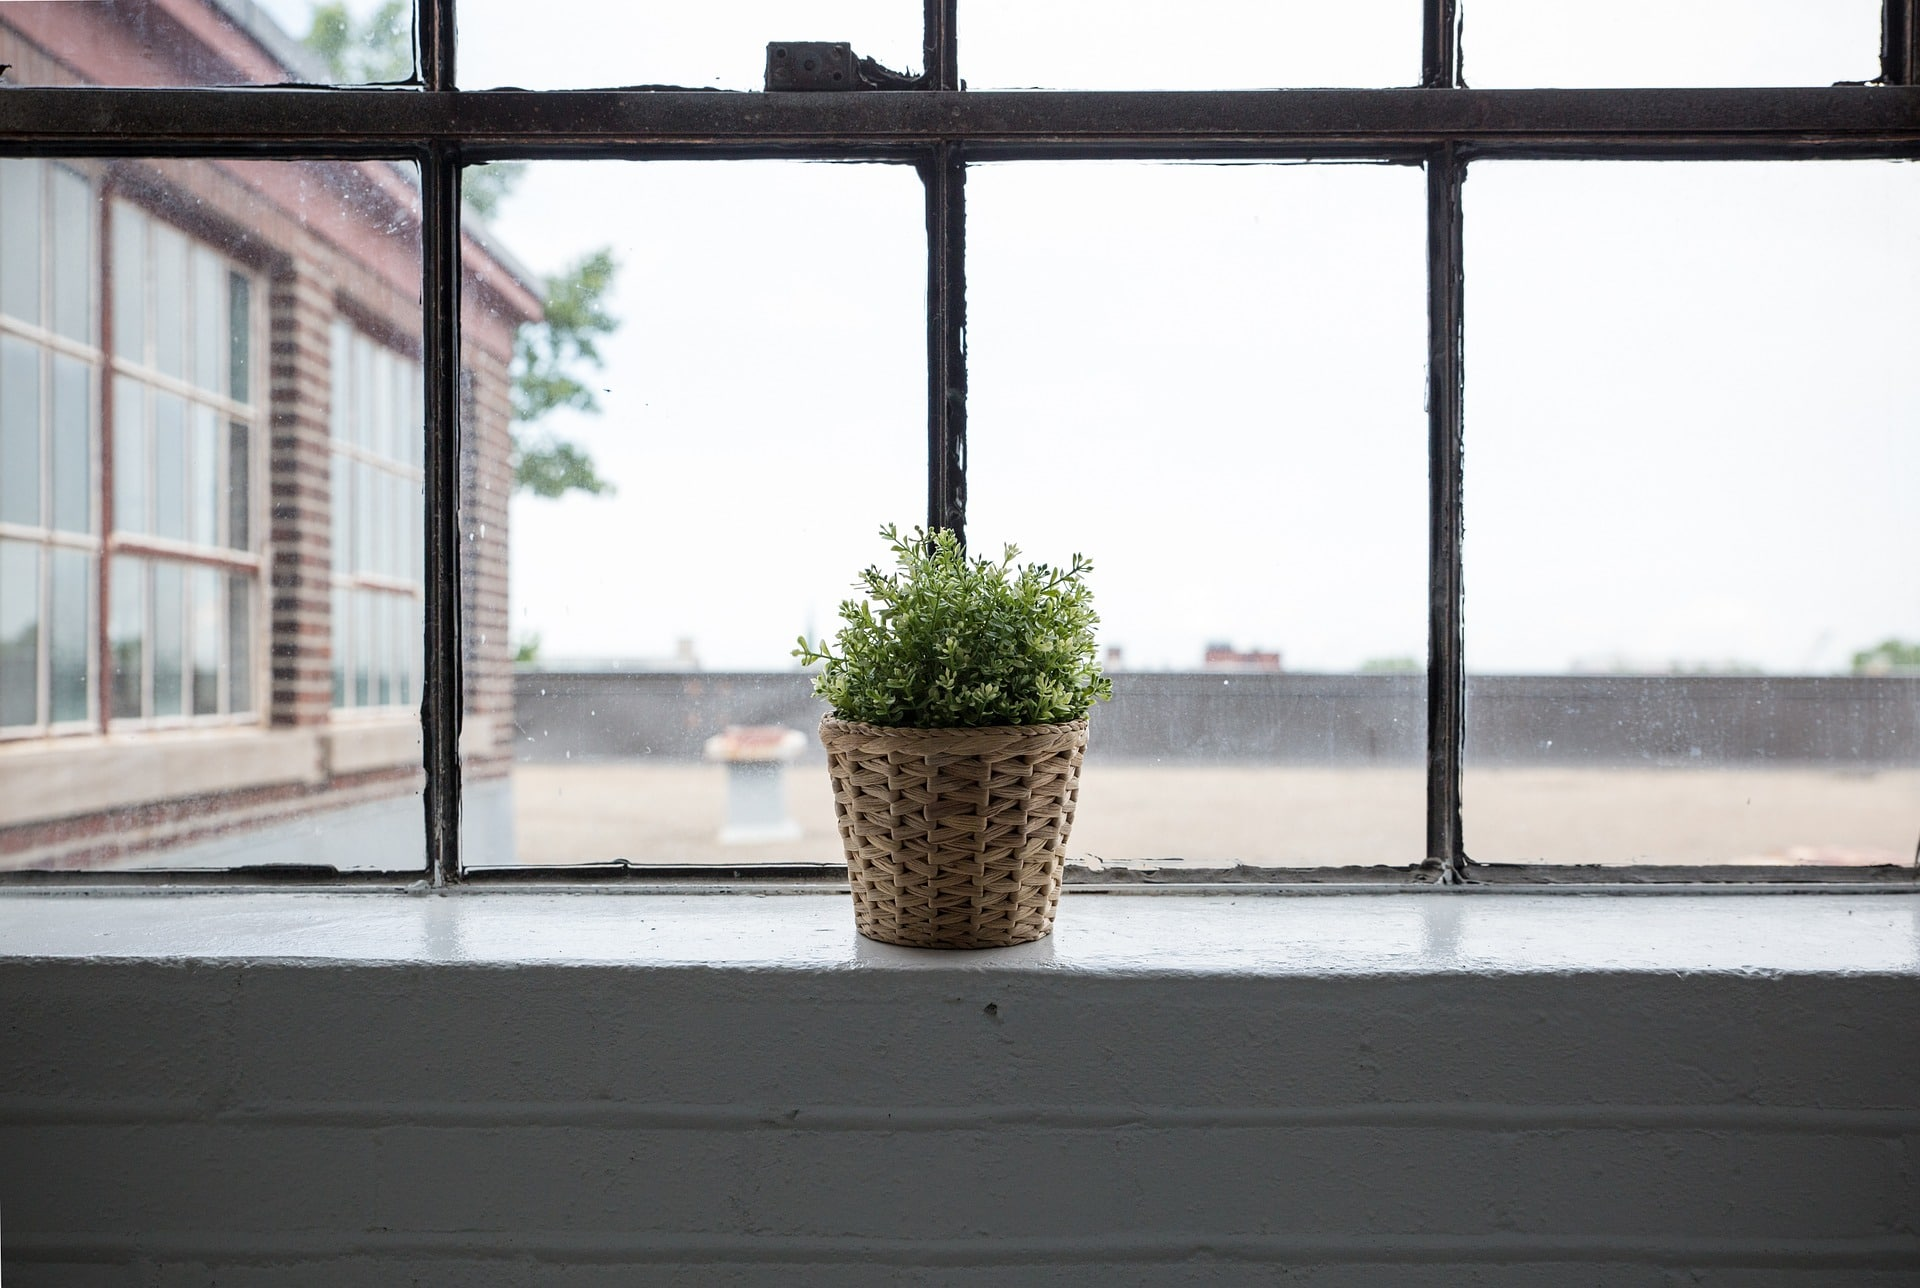 window-839824_1920